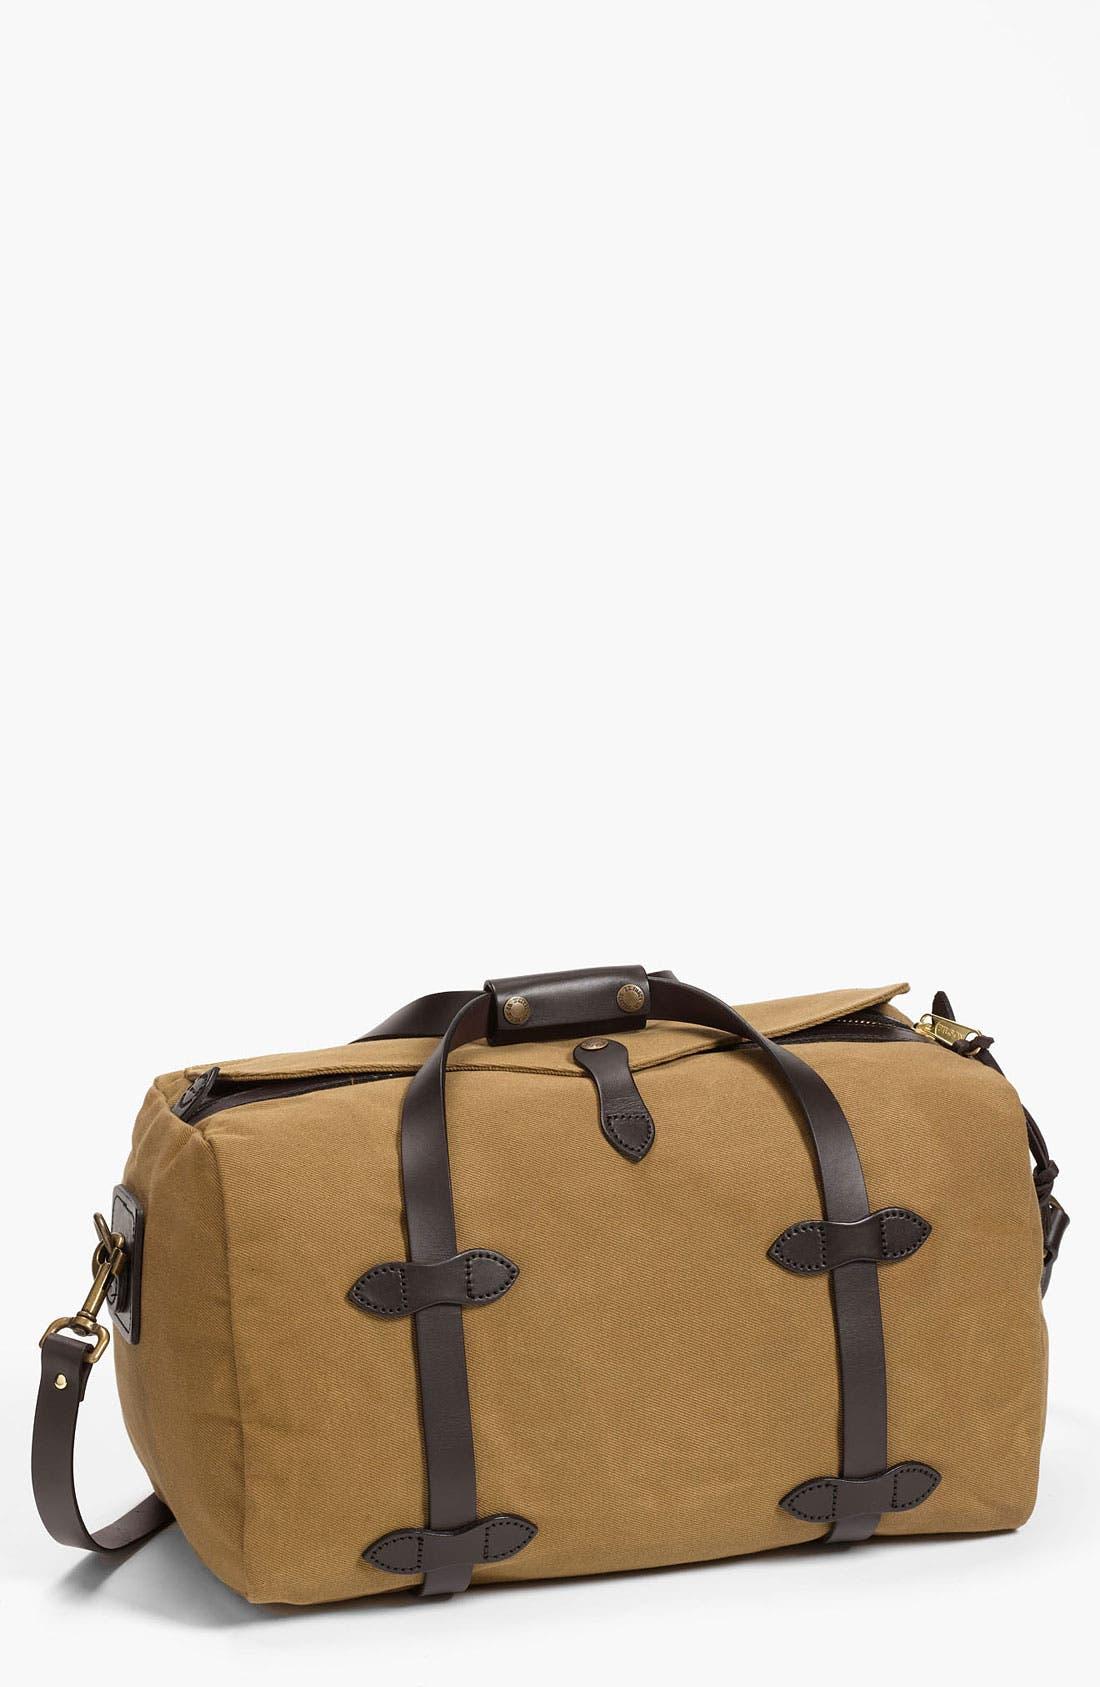 Alternate Image 1 Selected - Filson Small Duffel Bag